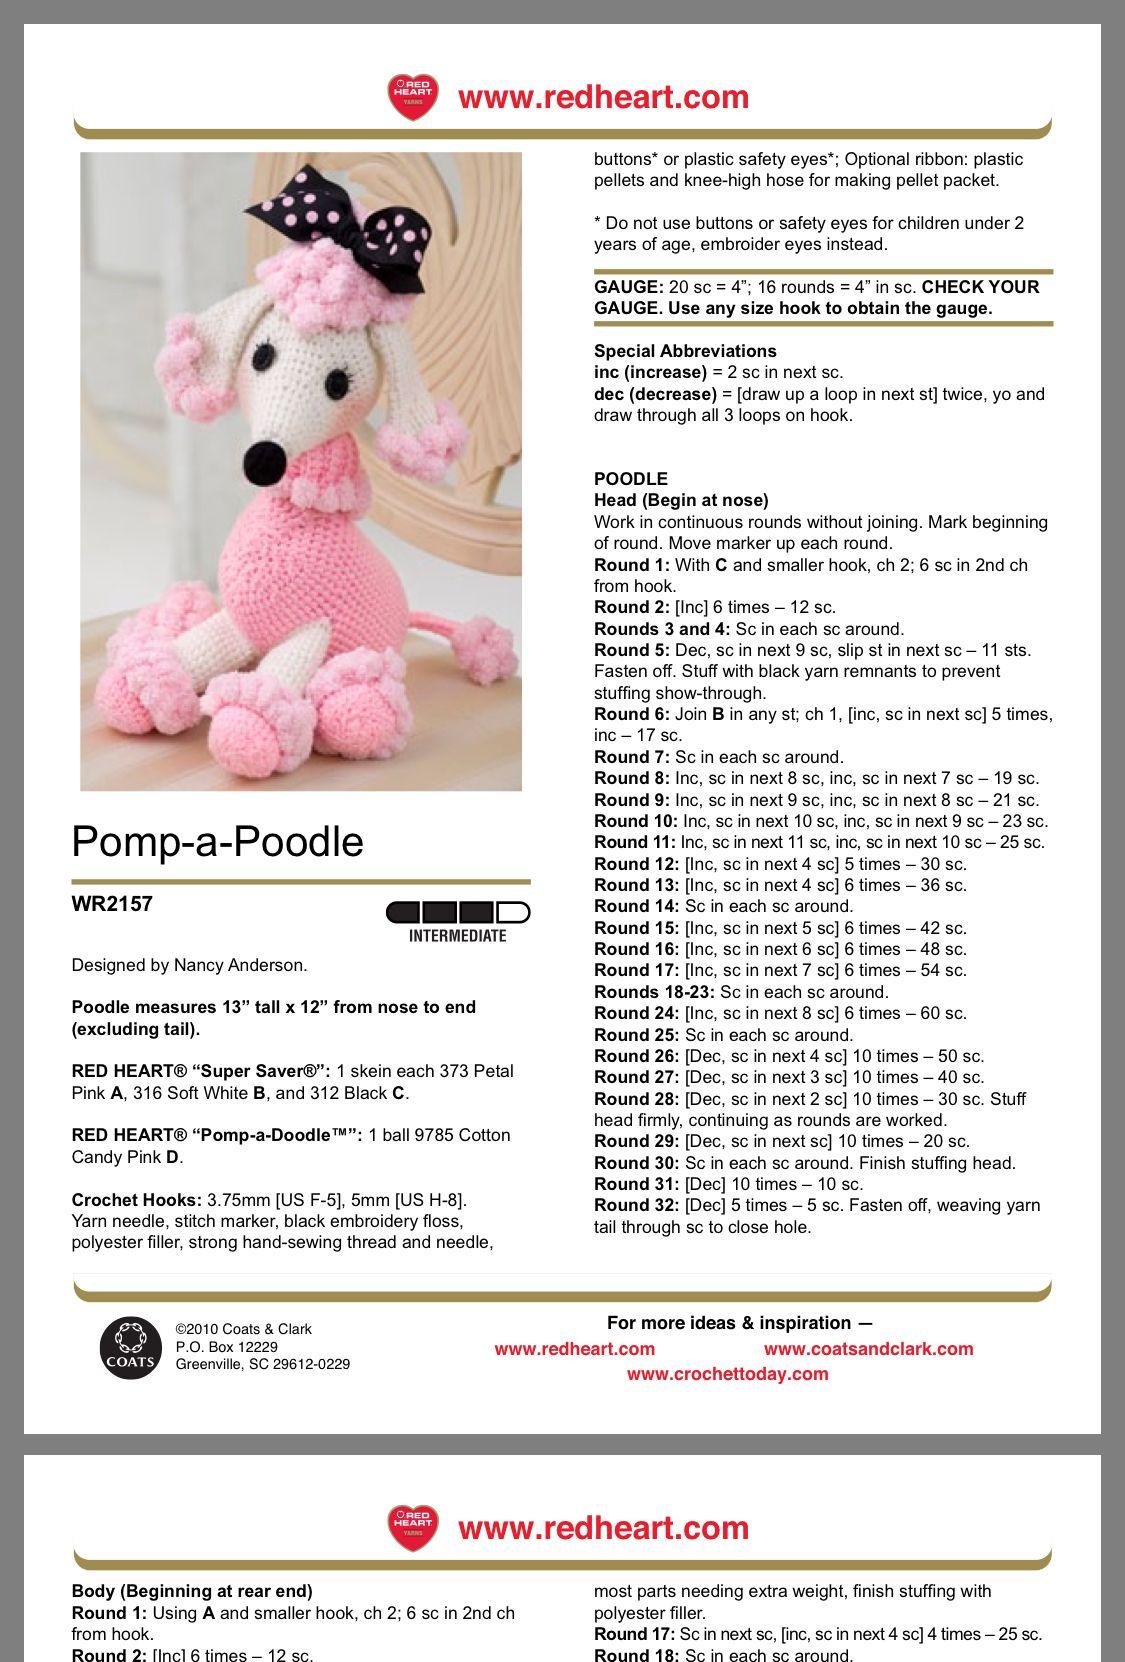 Pin by elaine gryga on stuffed toys | Pinterest | Toys, Pdf and Filing